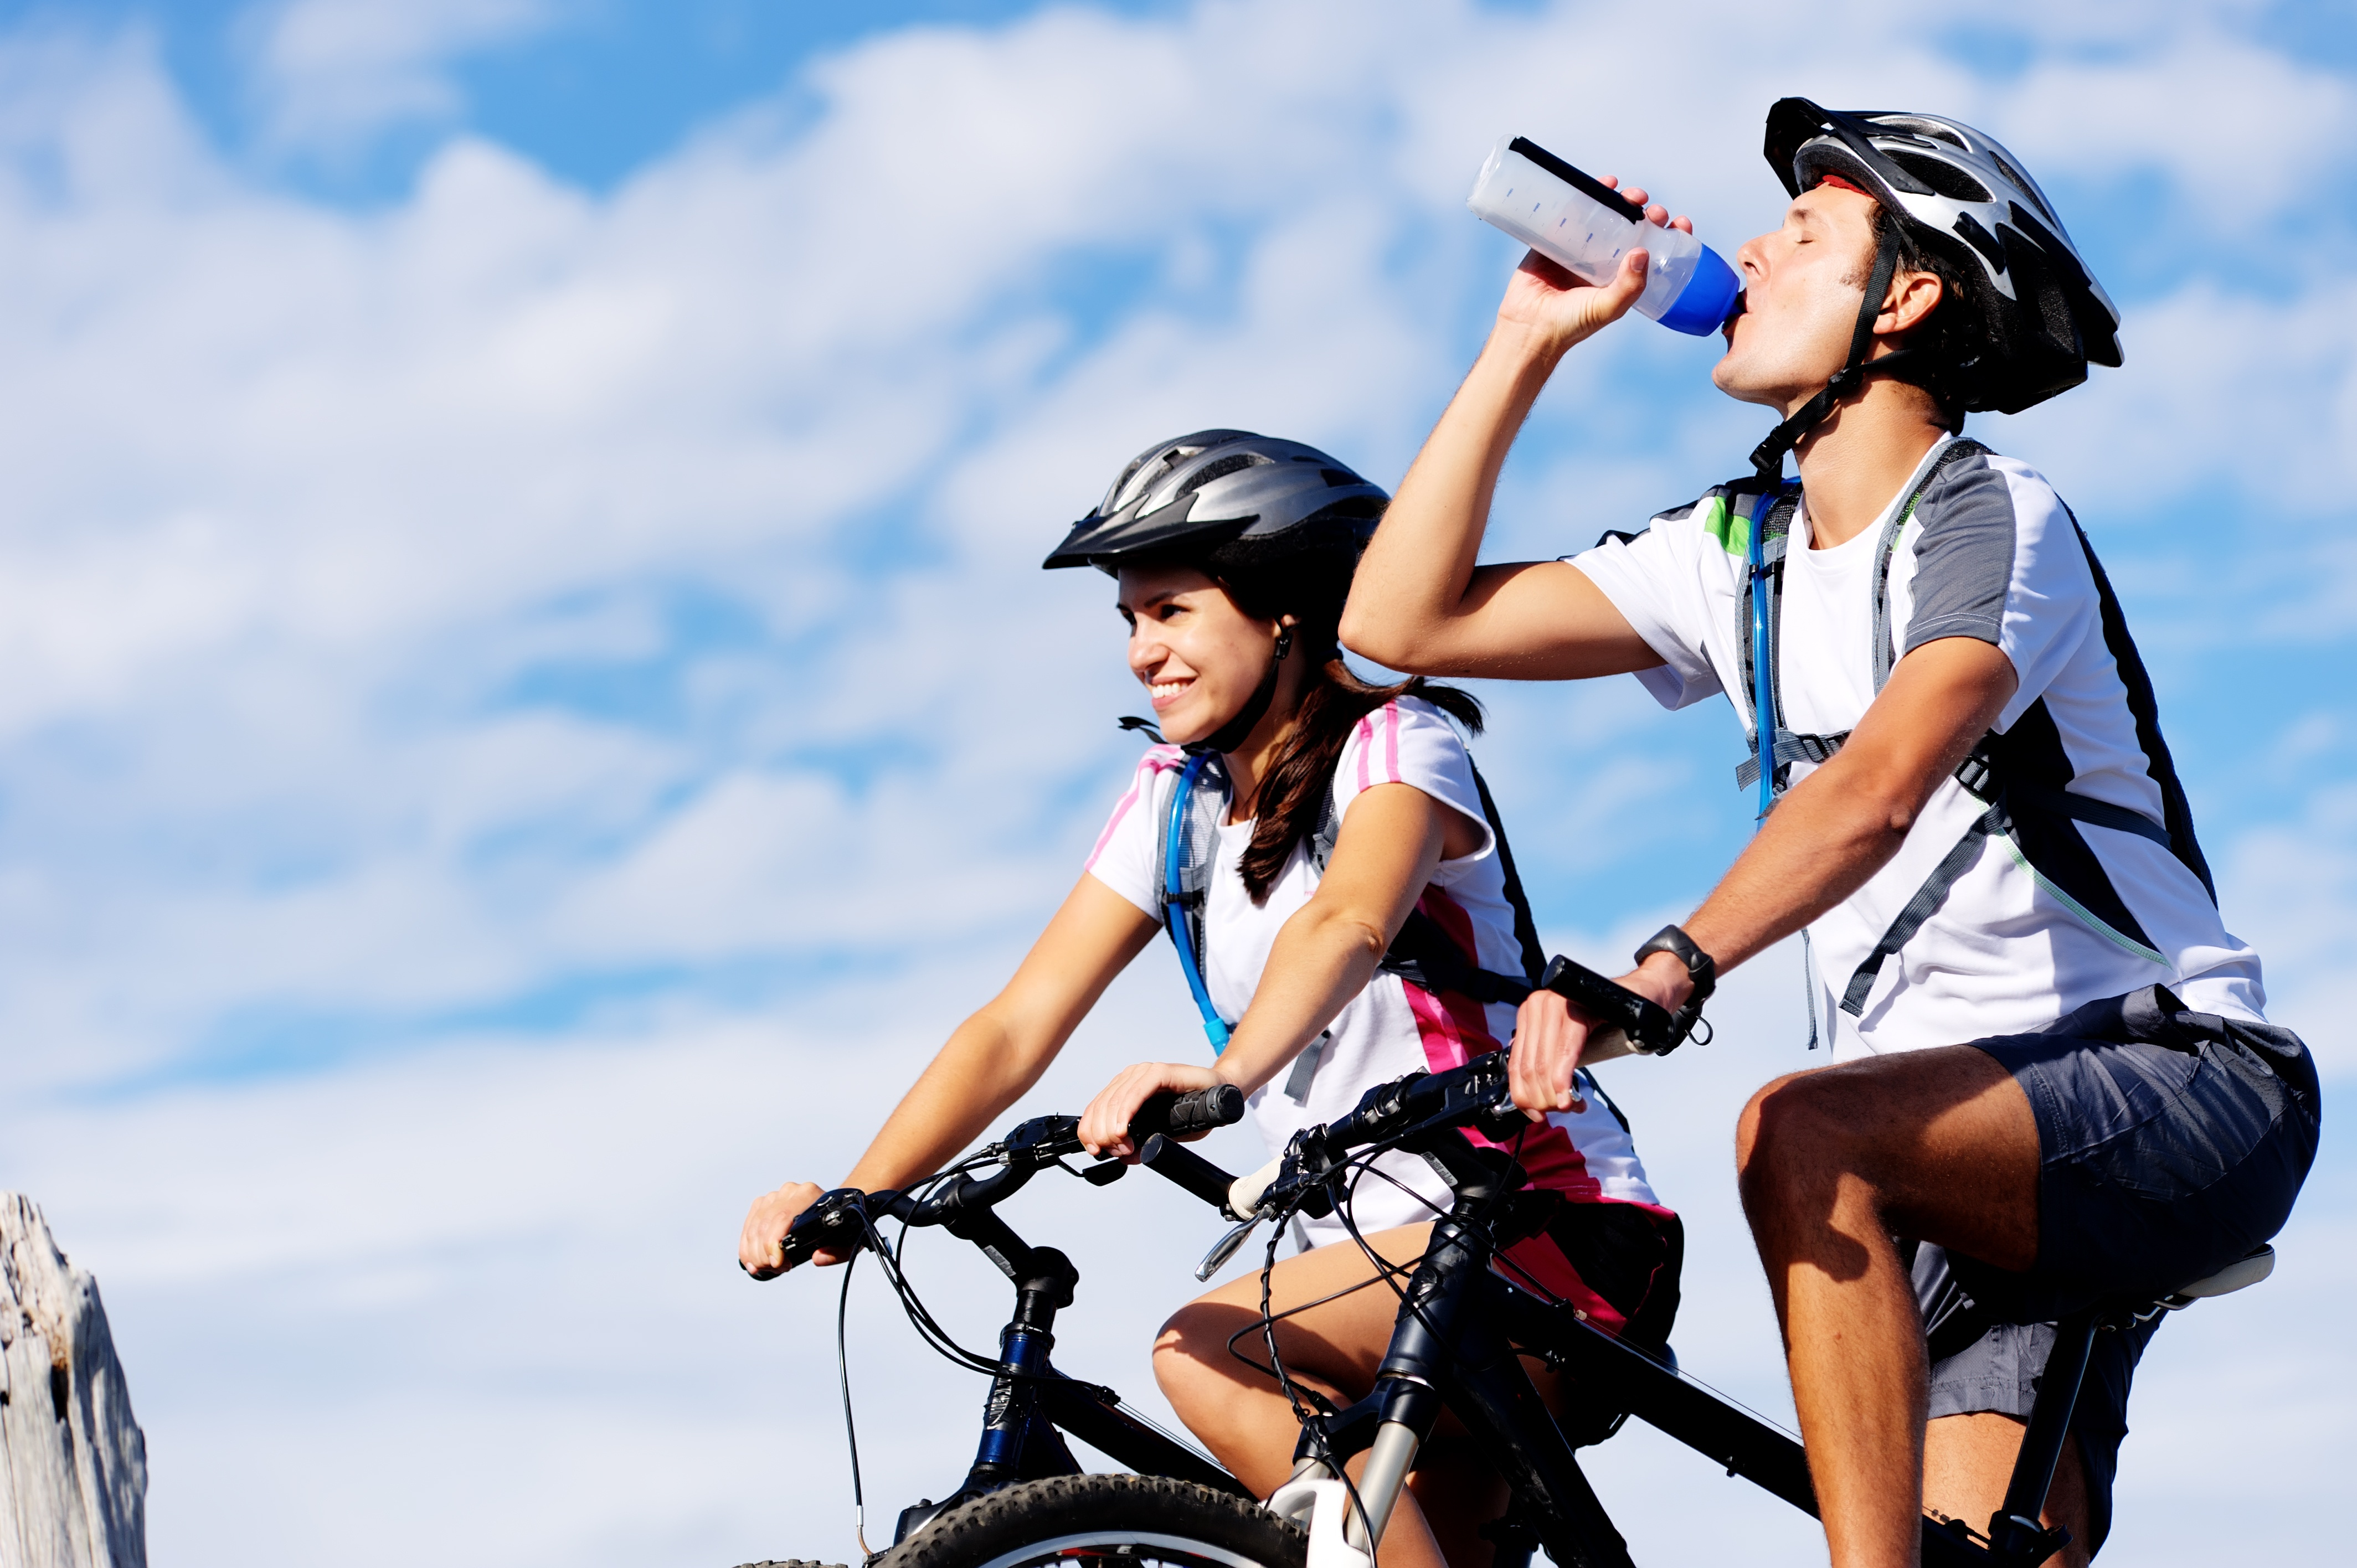 SportsNutrition-Bike-HighRes.jpg